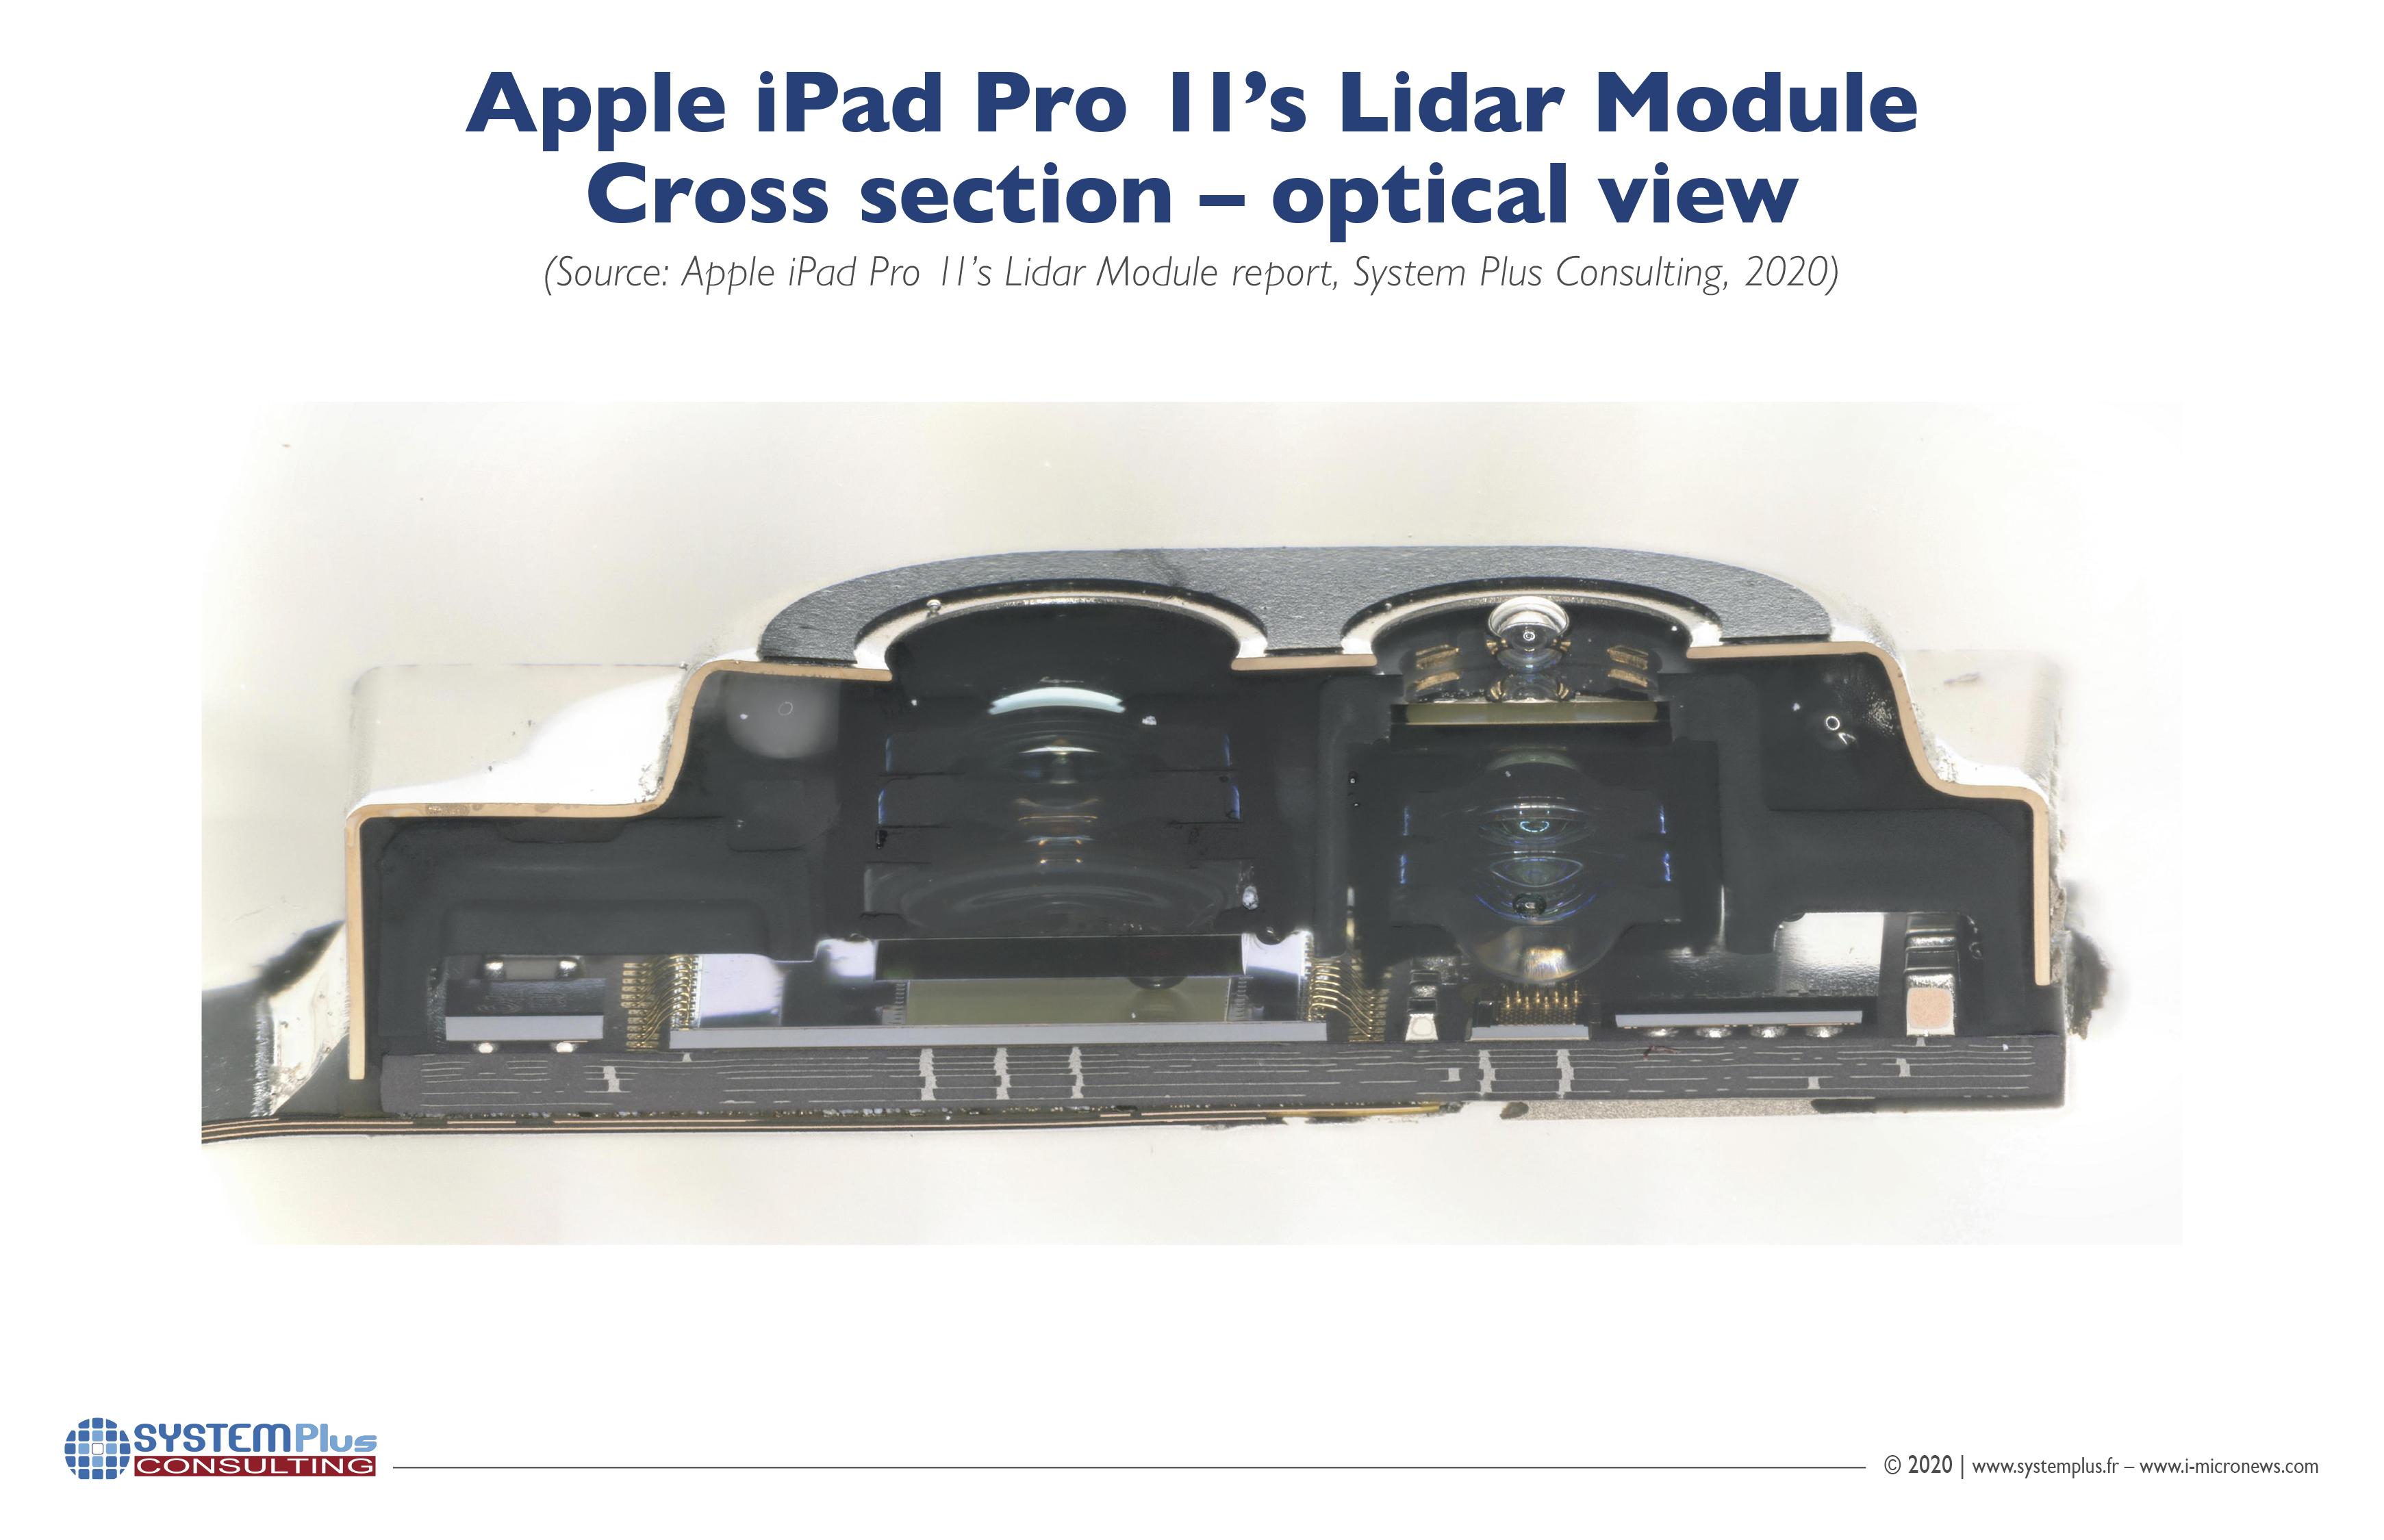 ILLUS_APPLE_IPAD_PRO_LIDAR_MODULE_CrossSectionOpticalView_SystemPlusConsulting_Oct2020